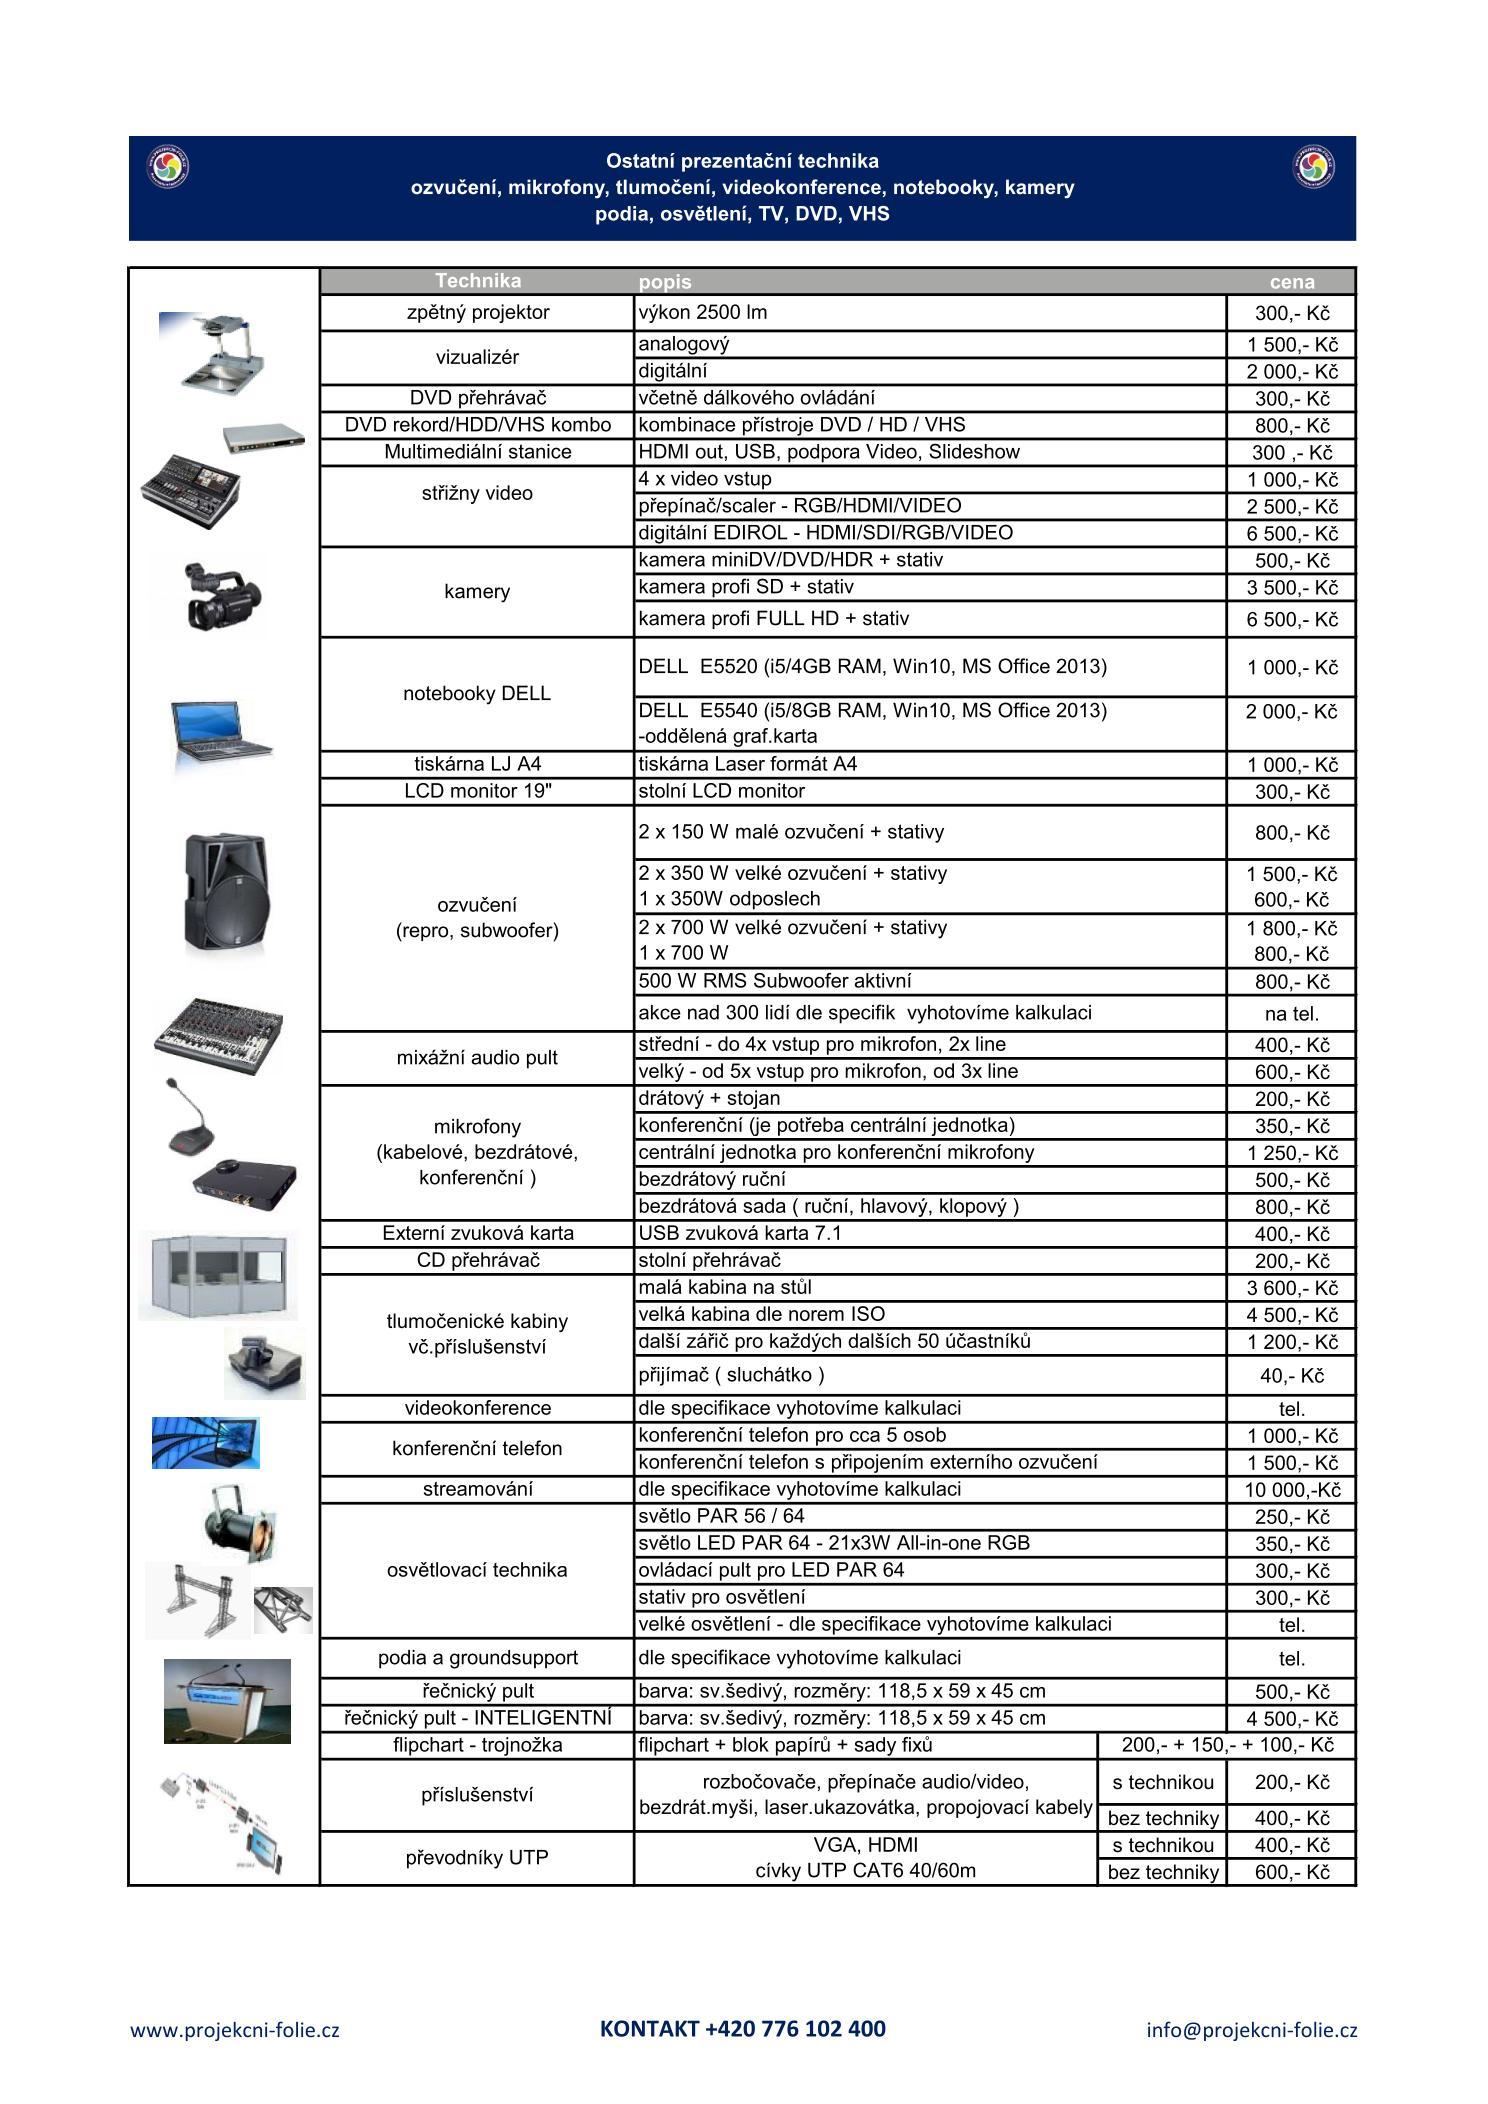 Pronájem AV techniky - str3